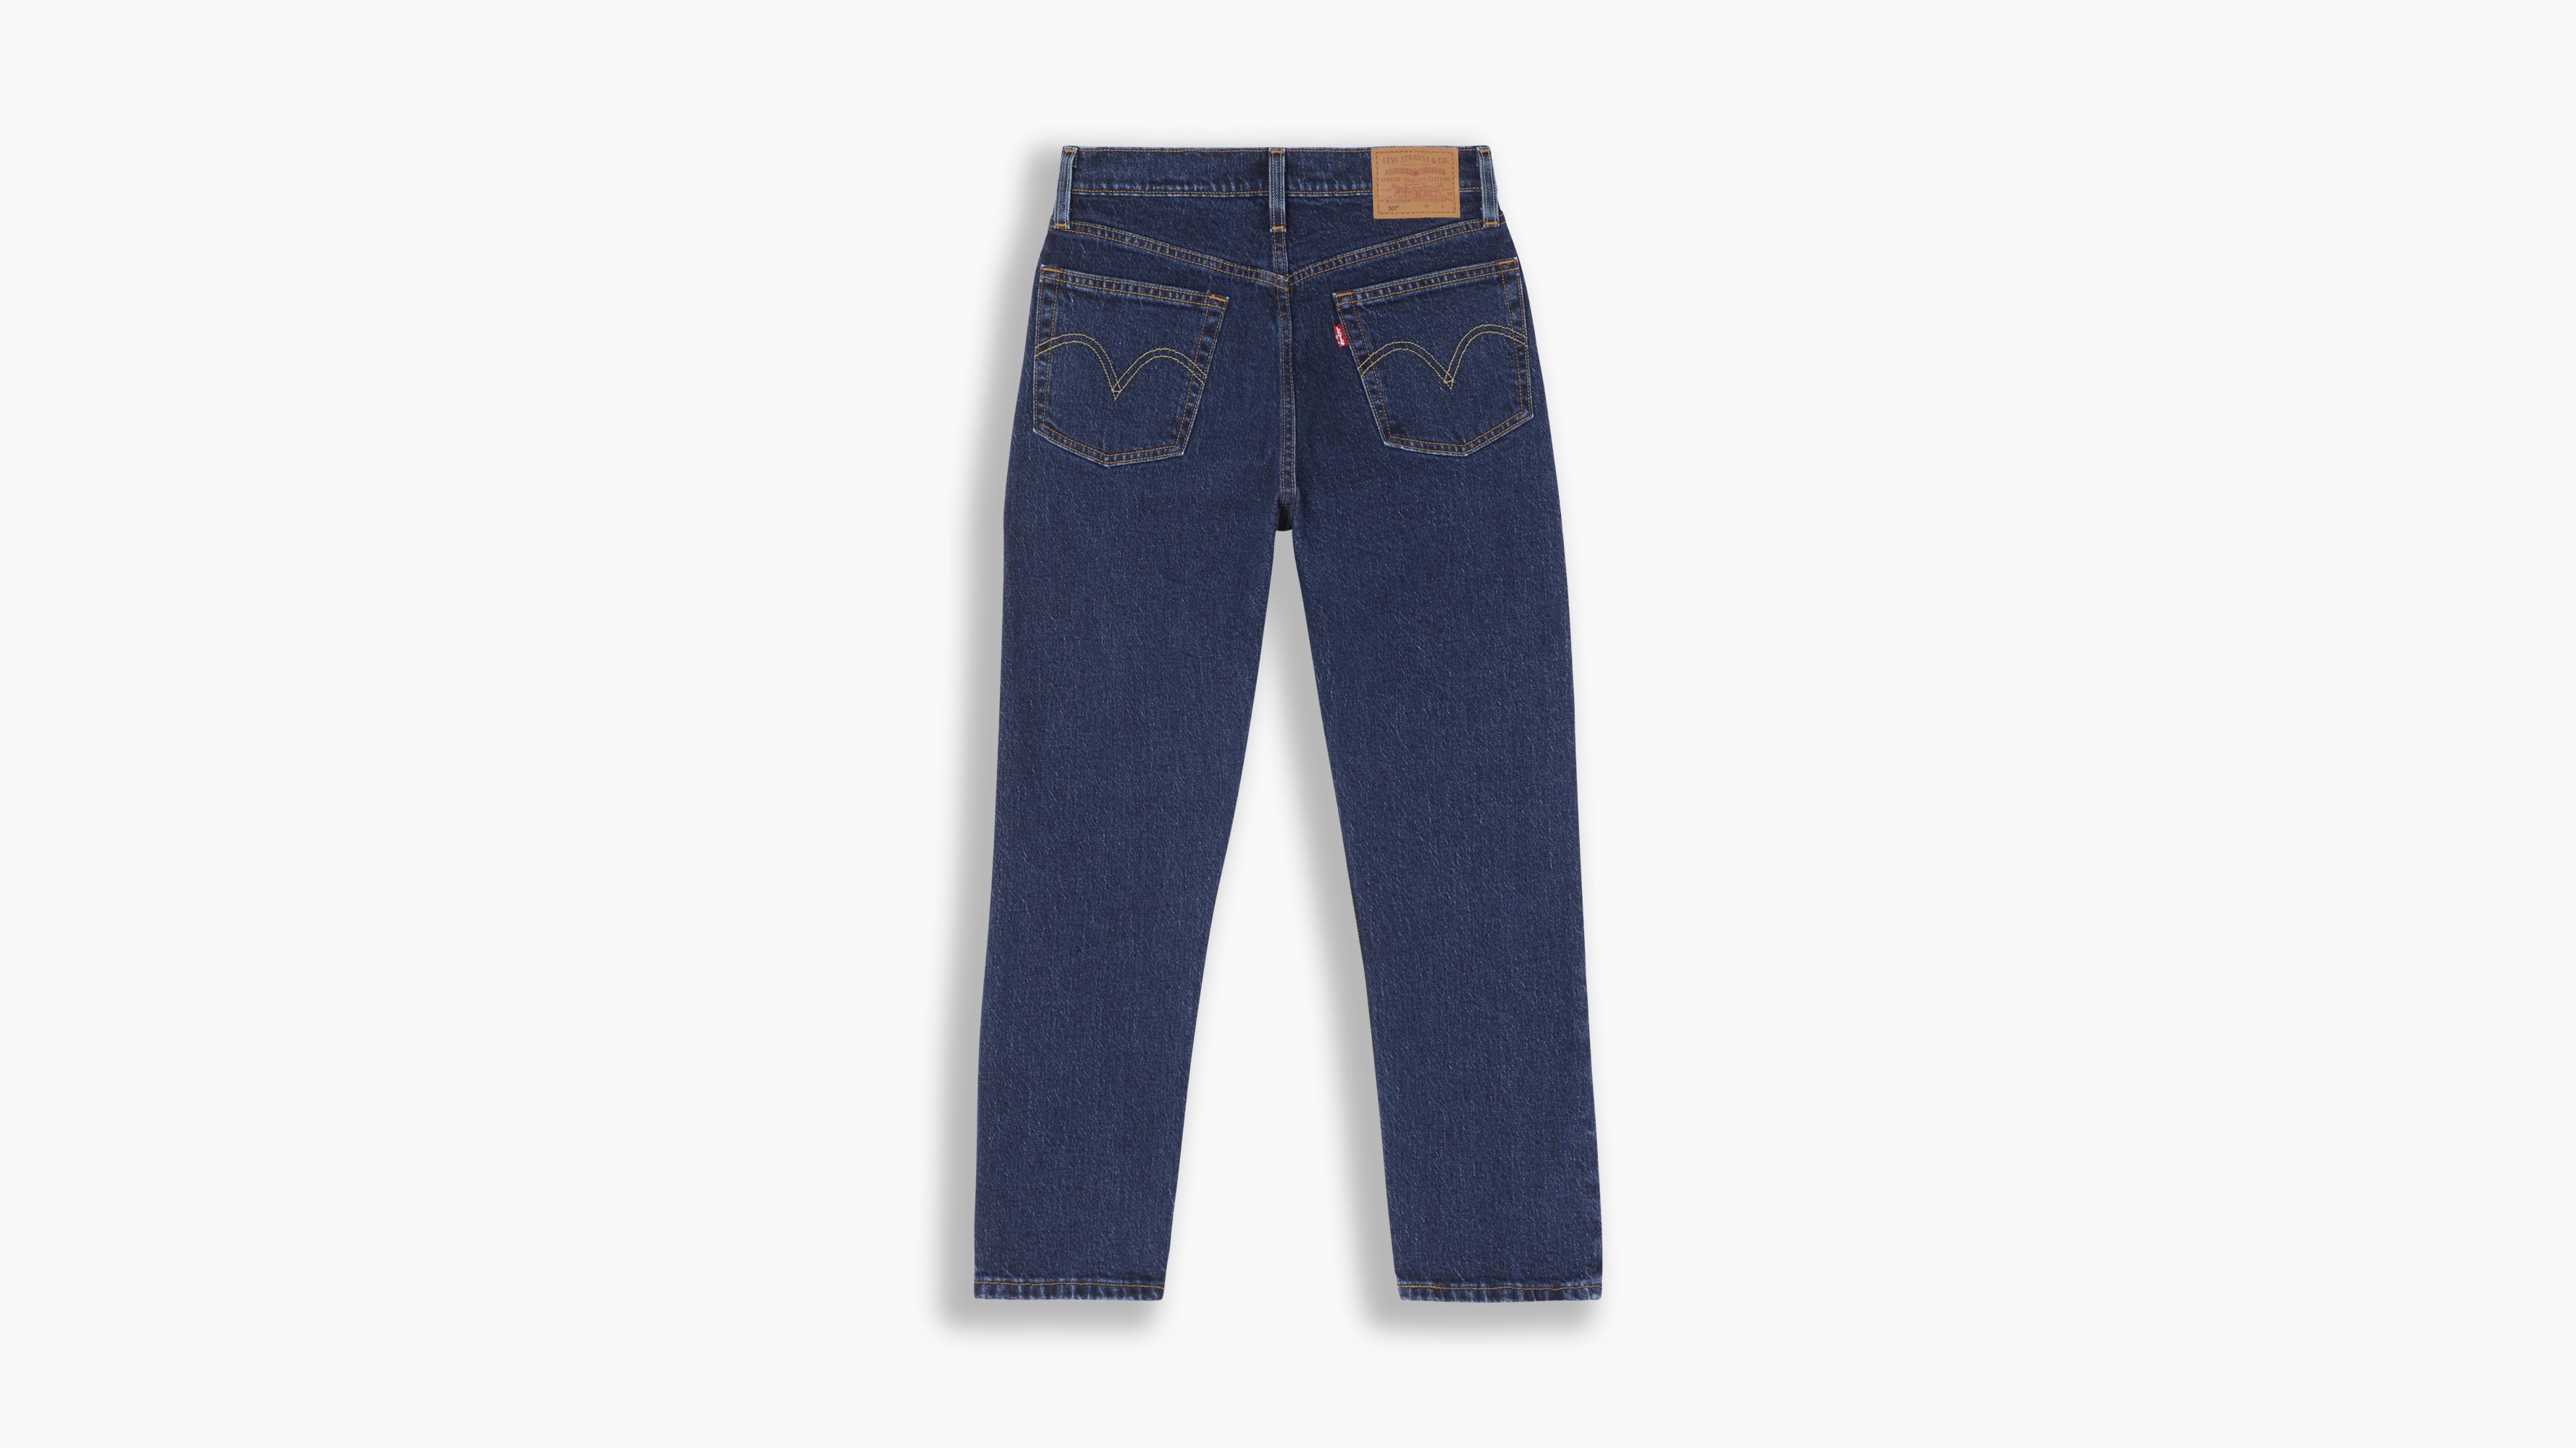 Levi's 501 Original Crop jeans, salsa stonewash, 26/30